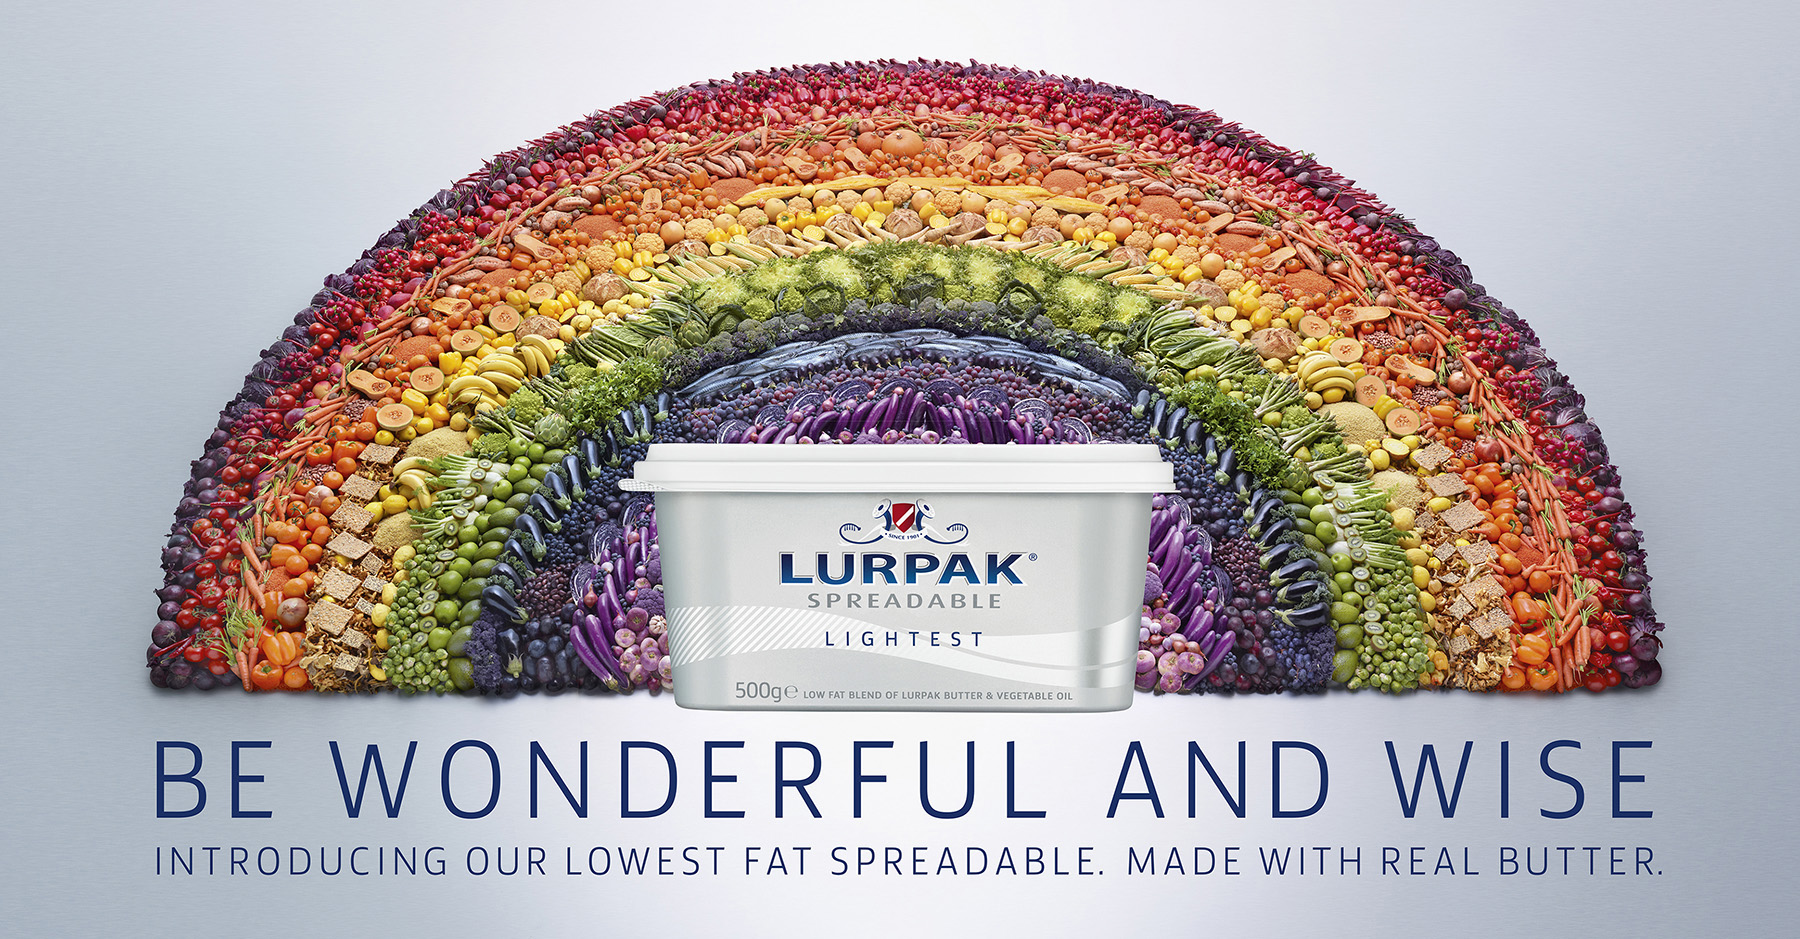 Lurpak_Be_wonderful